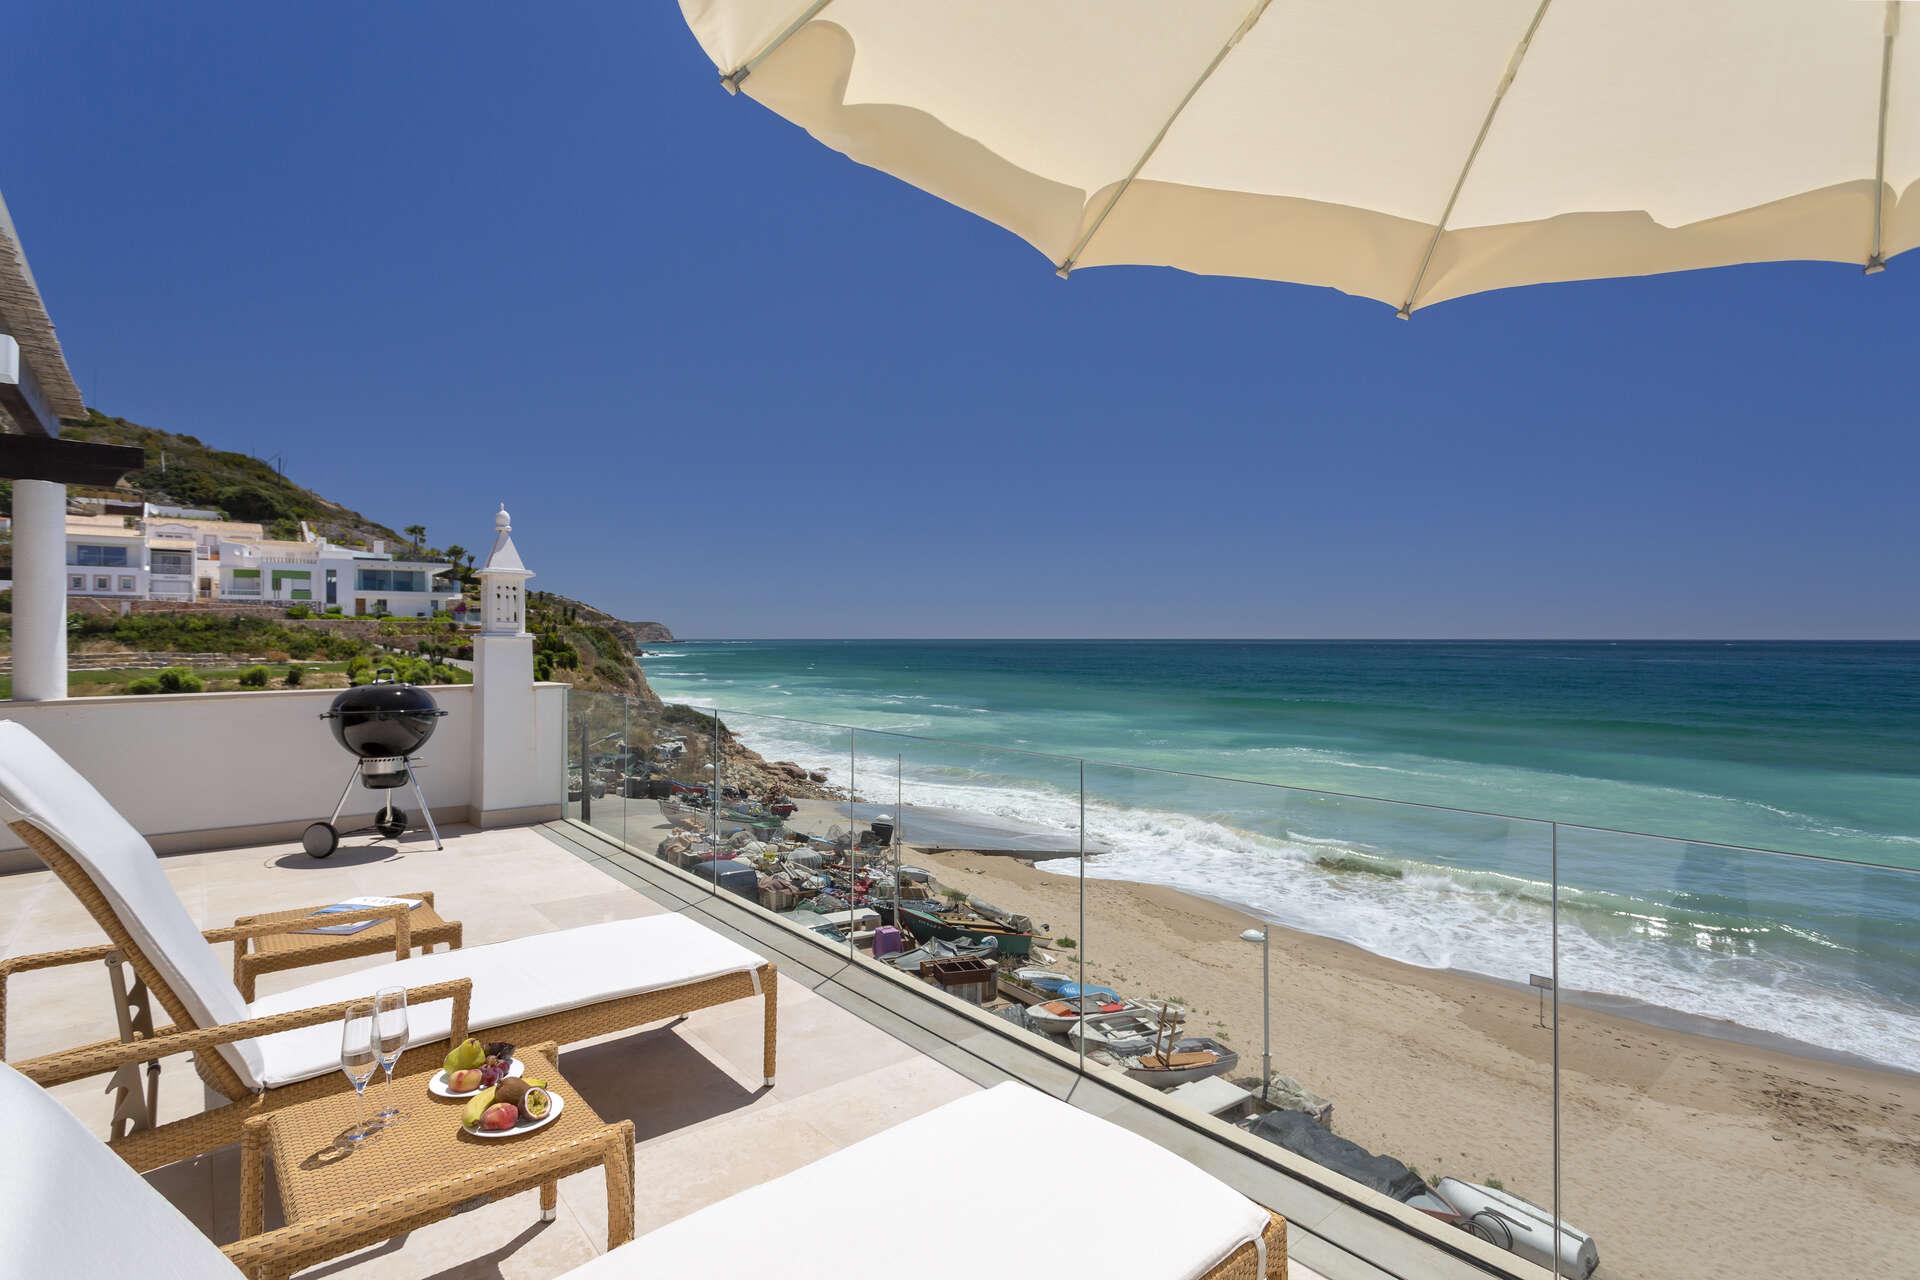 Luxury vacation rentals europe - Portugal - Algarve - Salema - Sol e Mar - Image 1/10